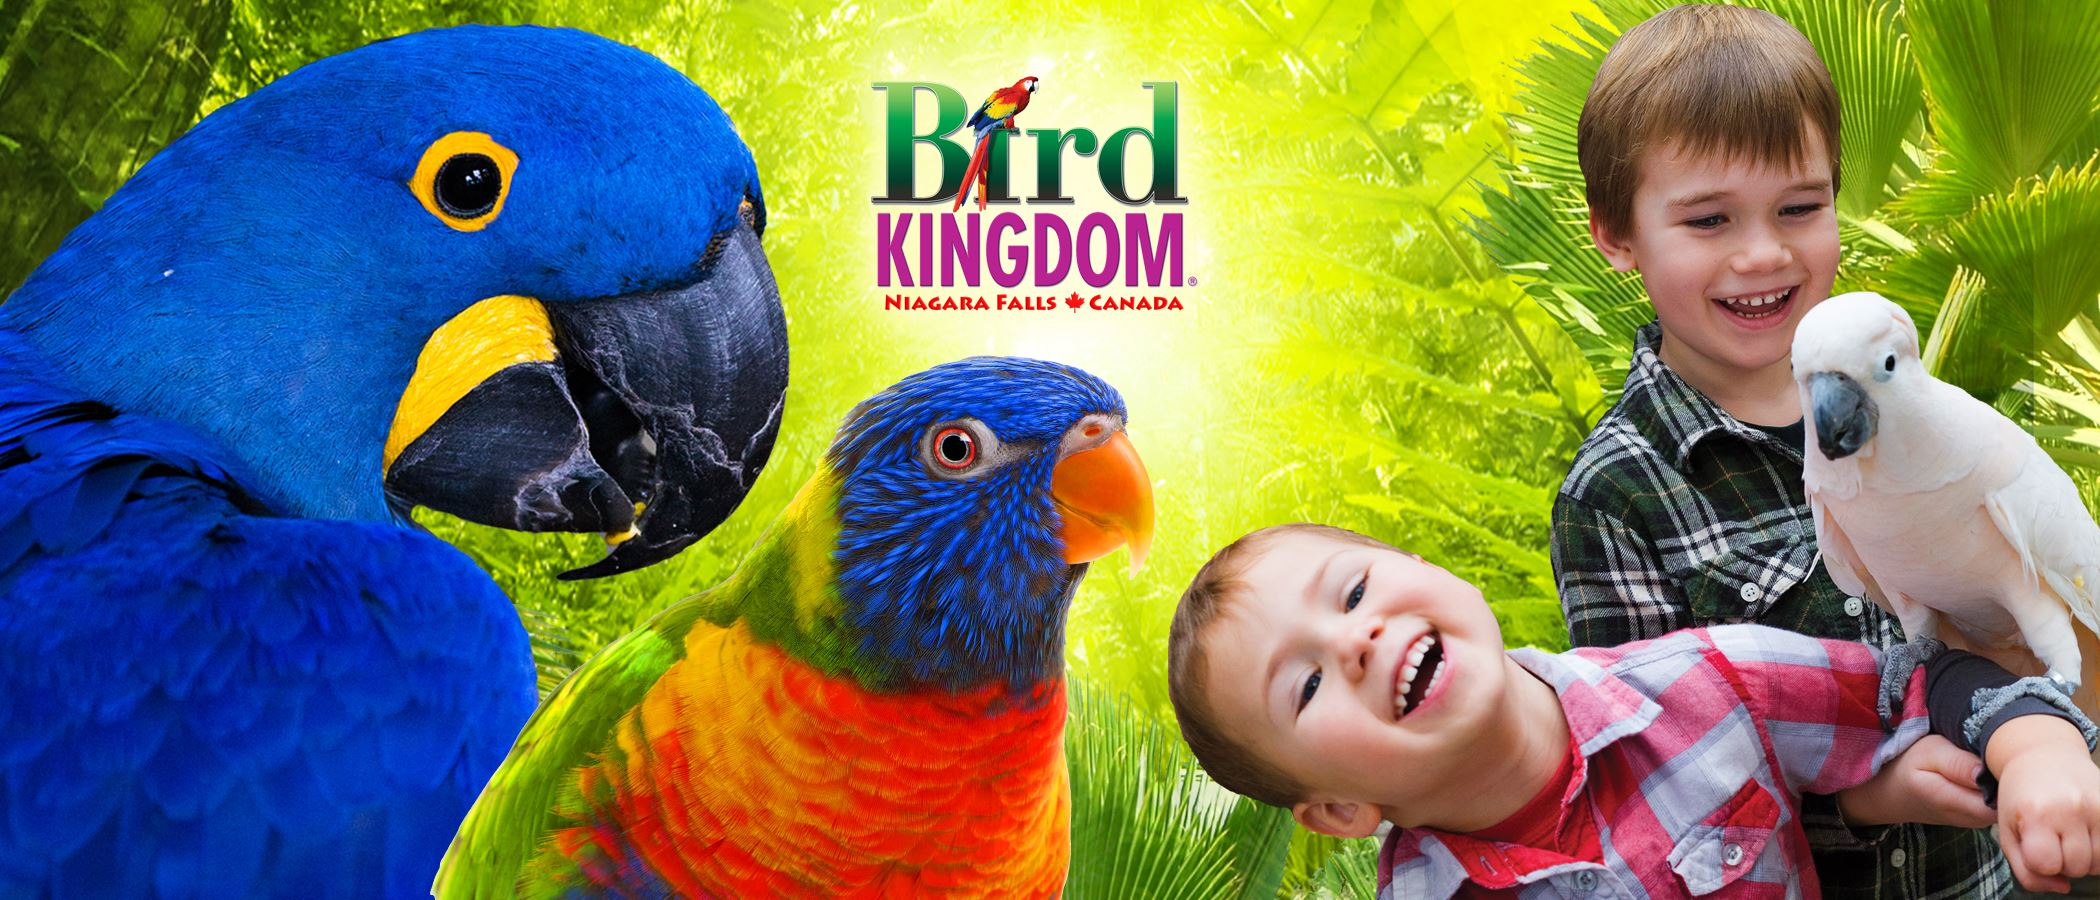 Bird Kingdon - Meet the Birds